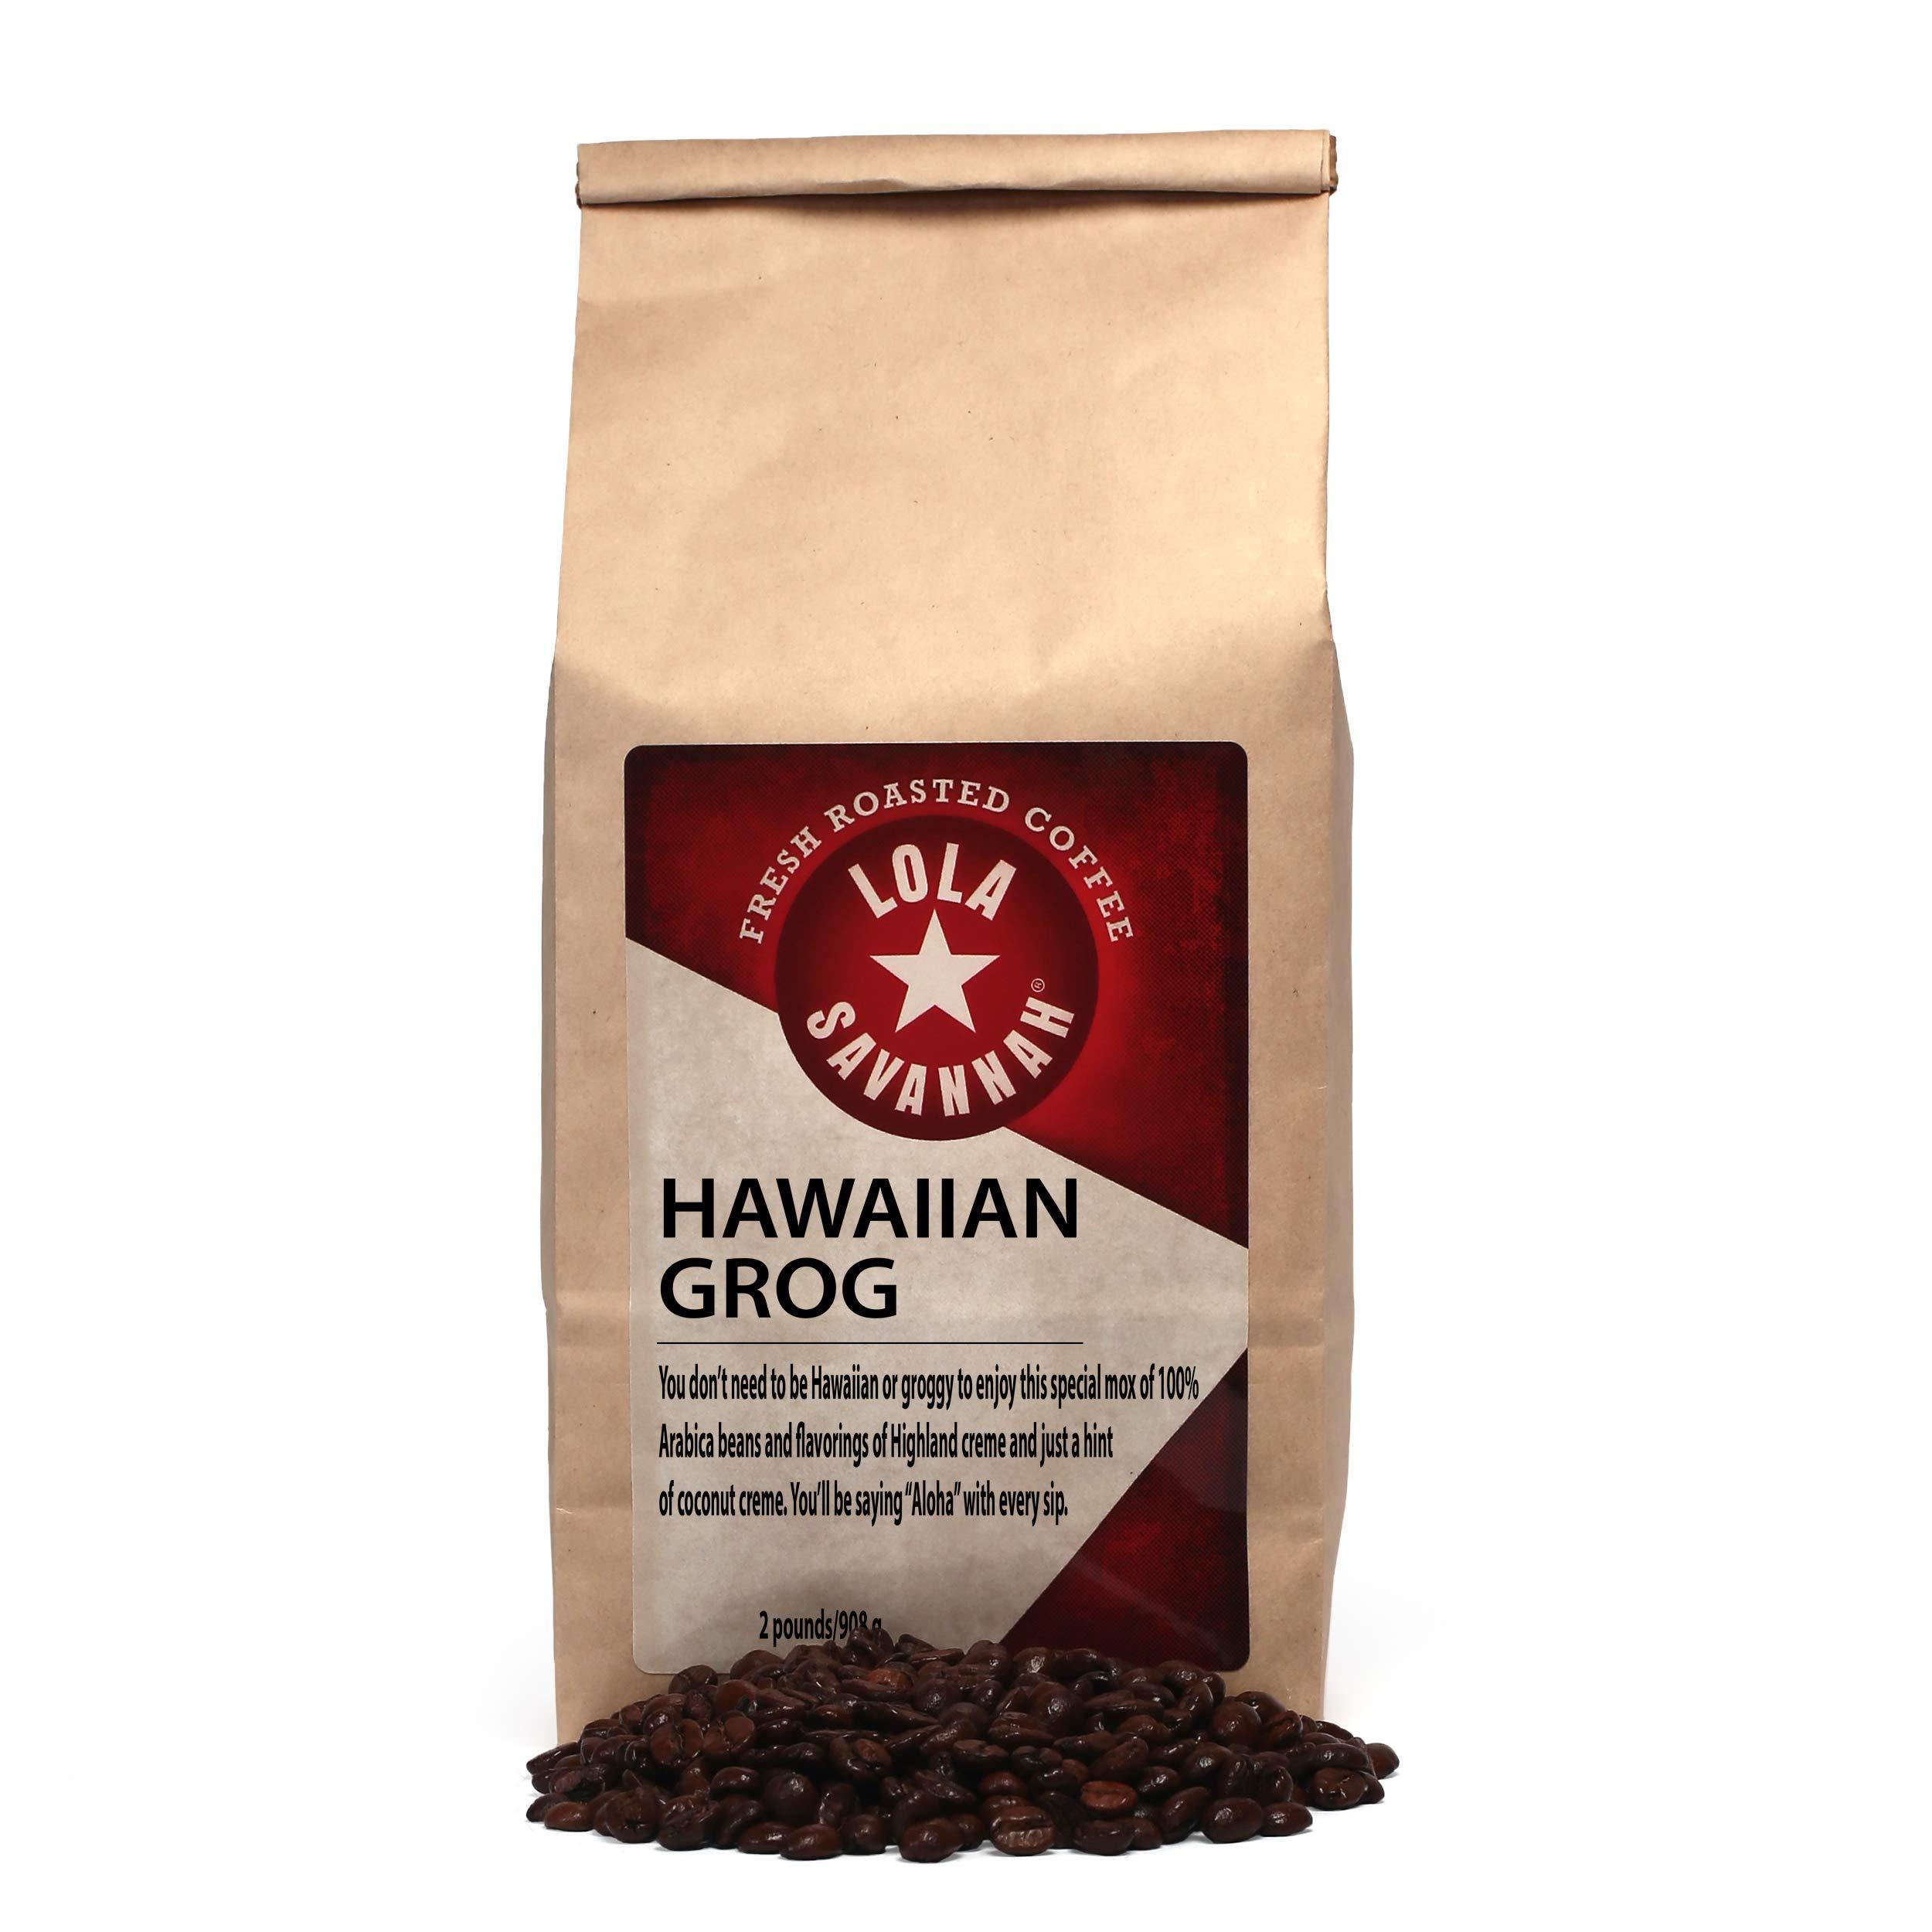 Lola Savannah Hawaiian Grog Whole Bean Coffee - Roasted Arabica Beans Bring the Flavors Of The Tropics To Your Cup Of Coffee | Caffeinated | 2lb Bag